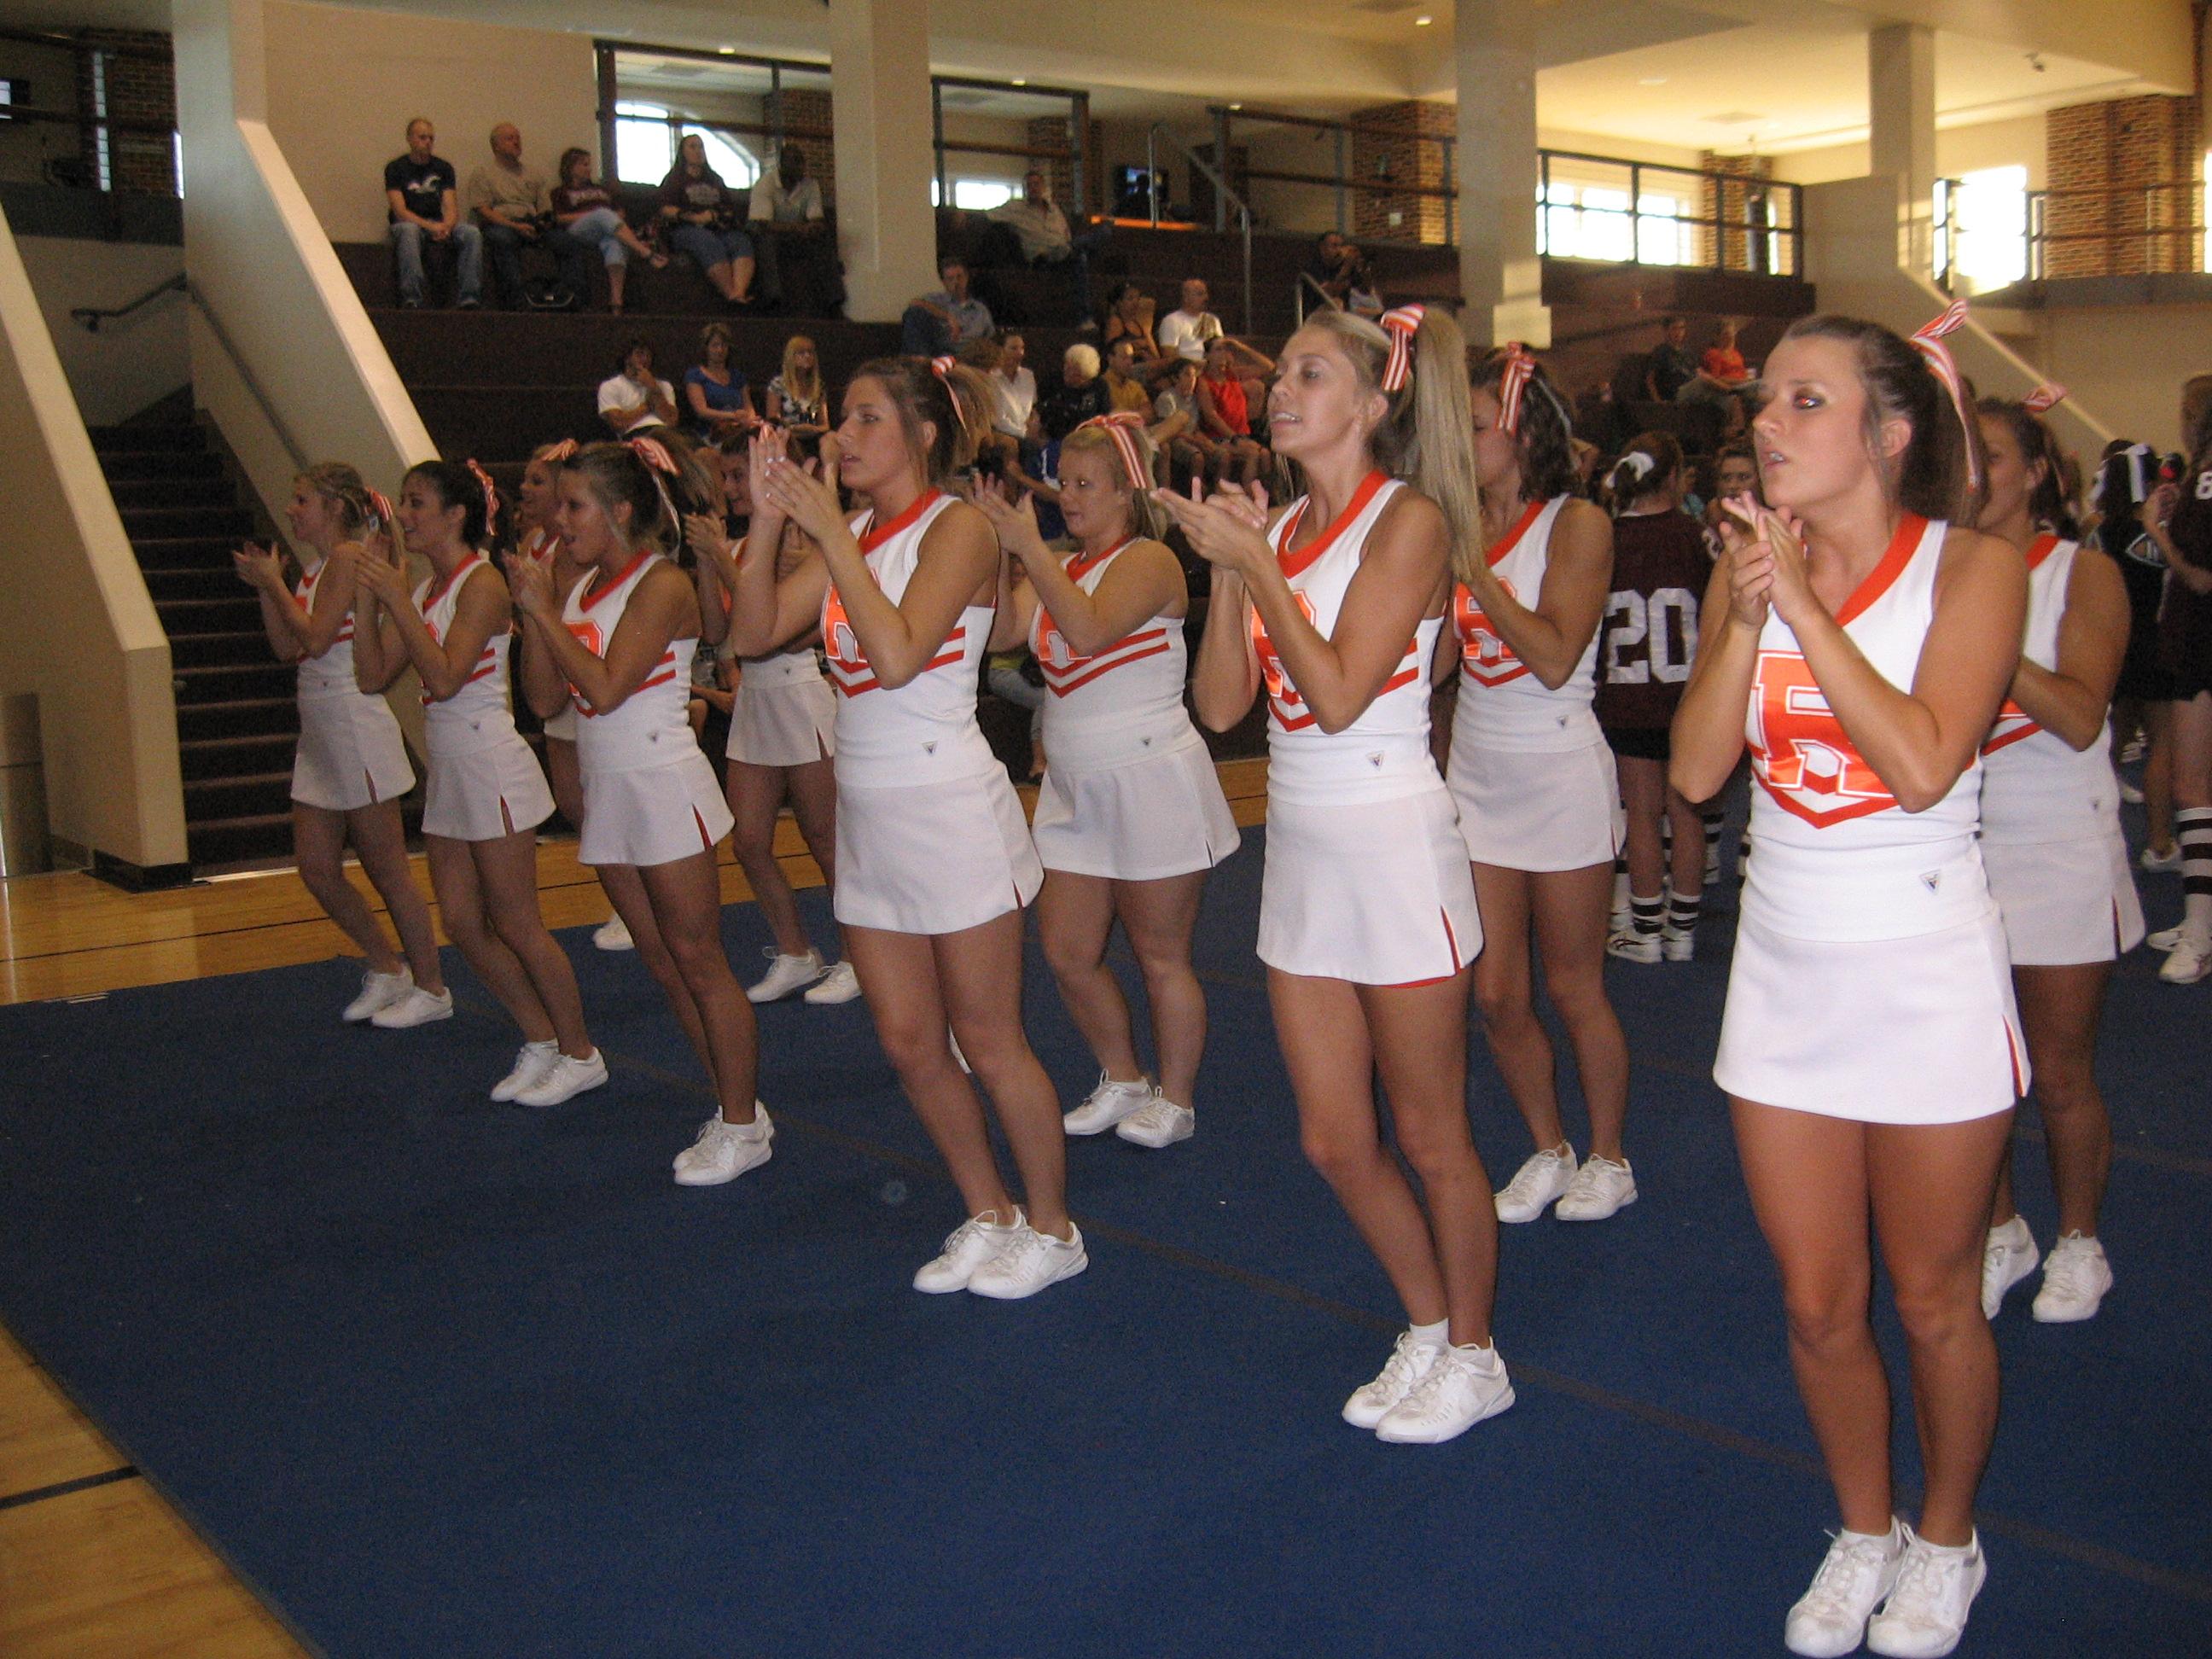 High School cheerleaders 1 - Gallery   eBaums World